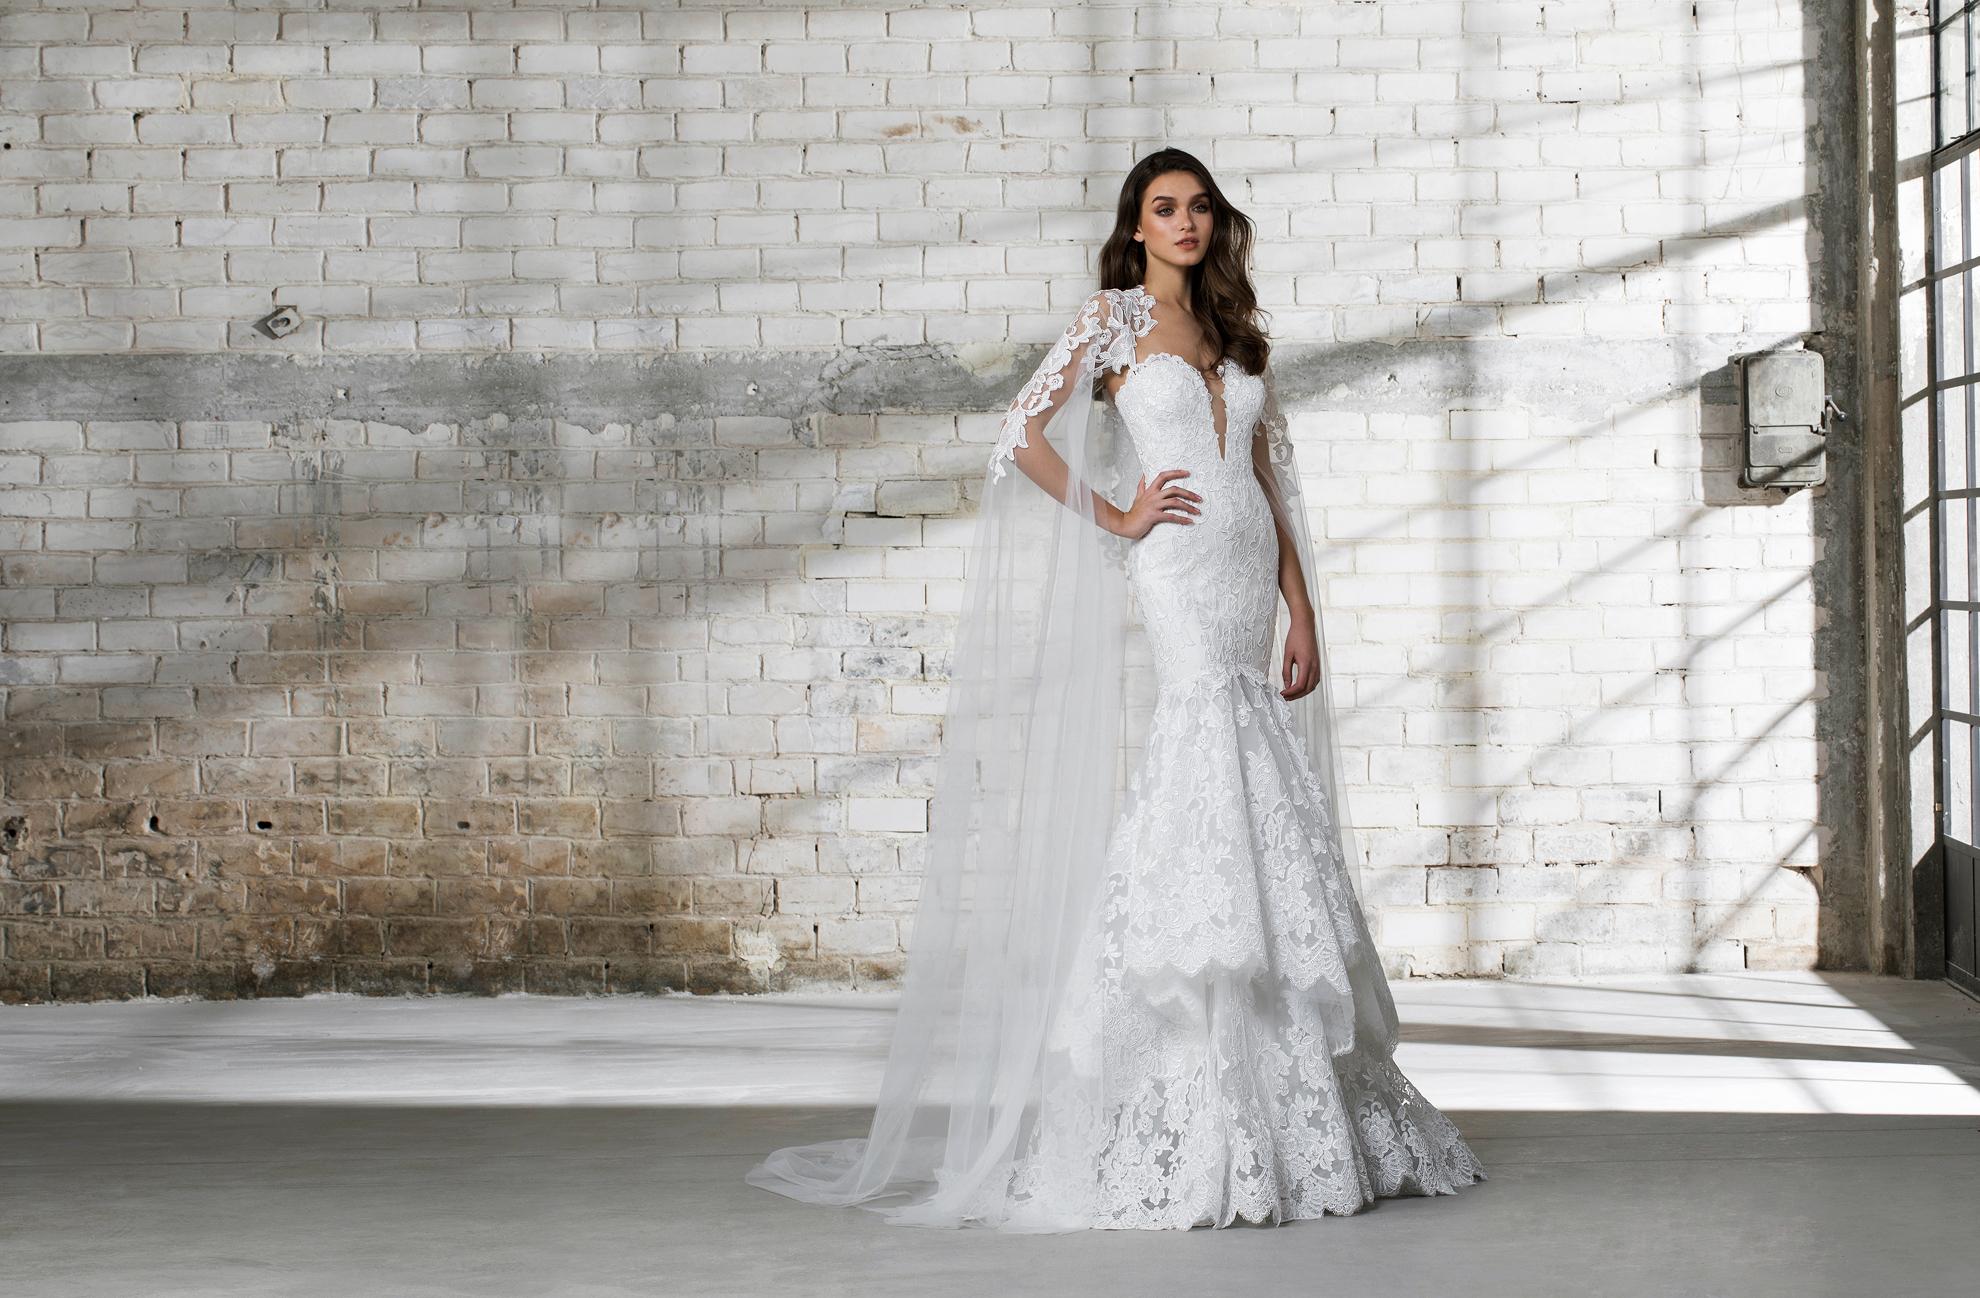 pnina tornai wedding dress spring 2019 lace trumpet cape